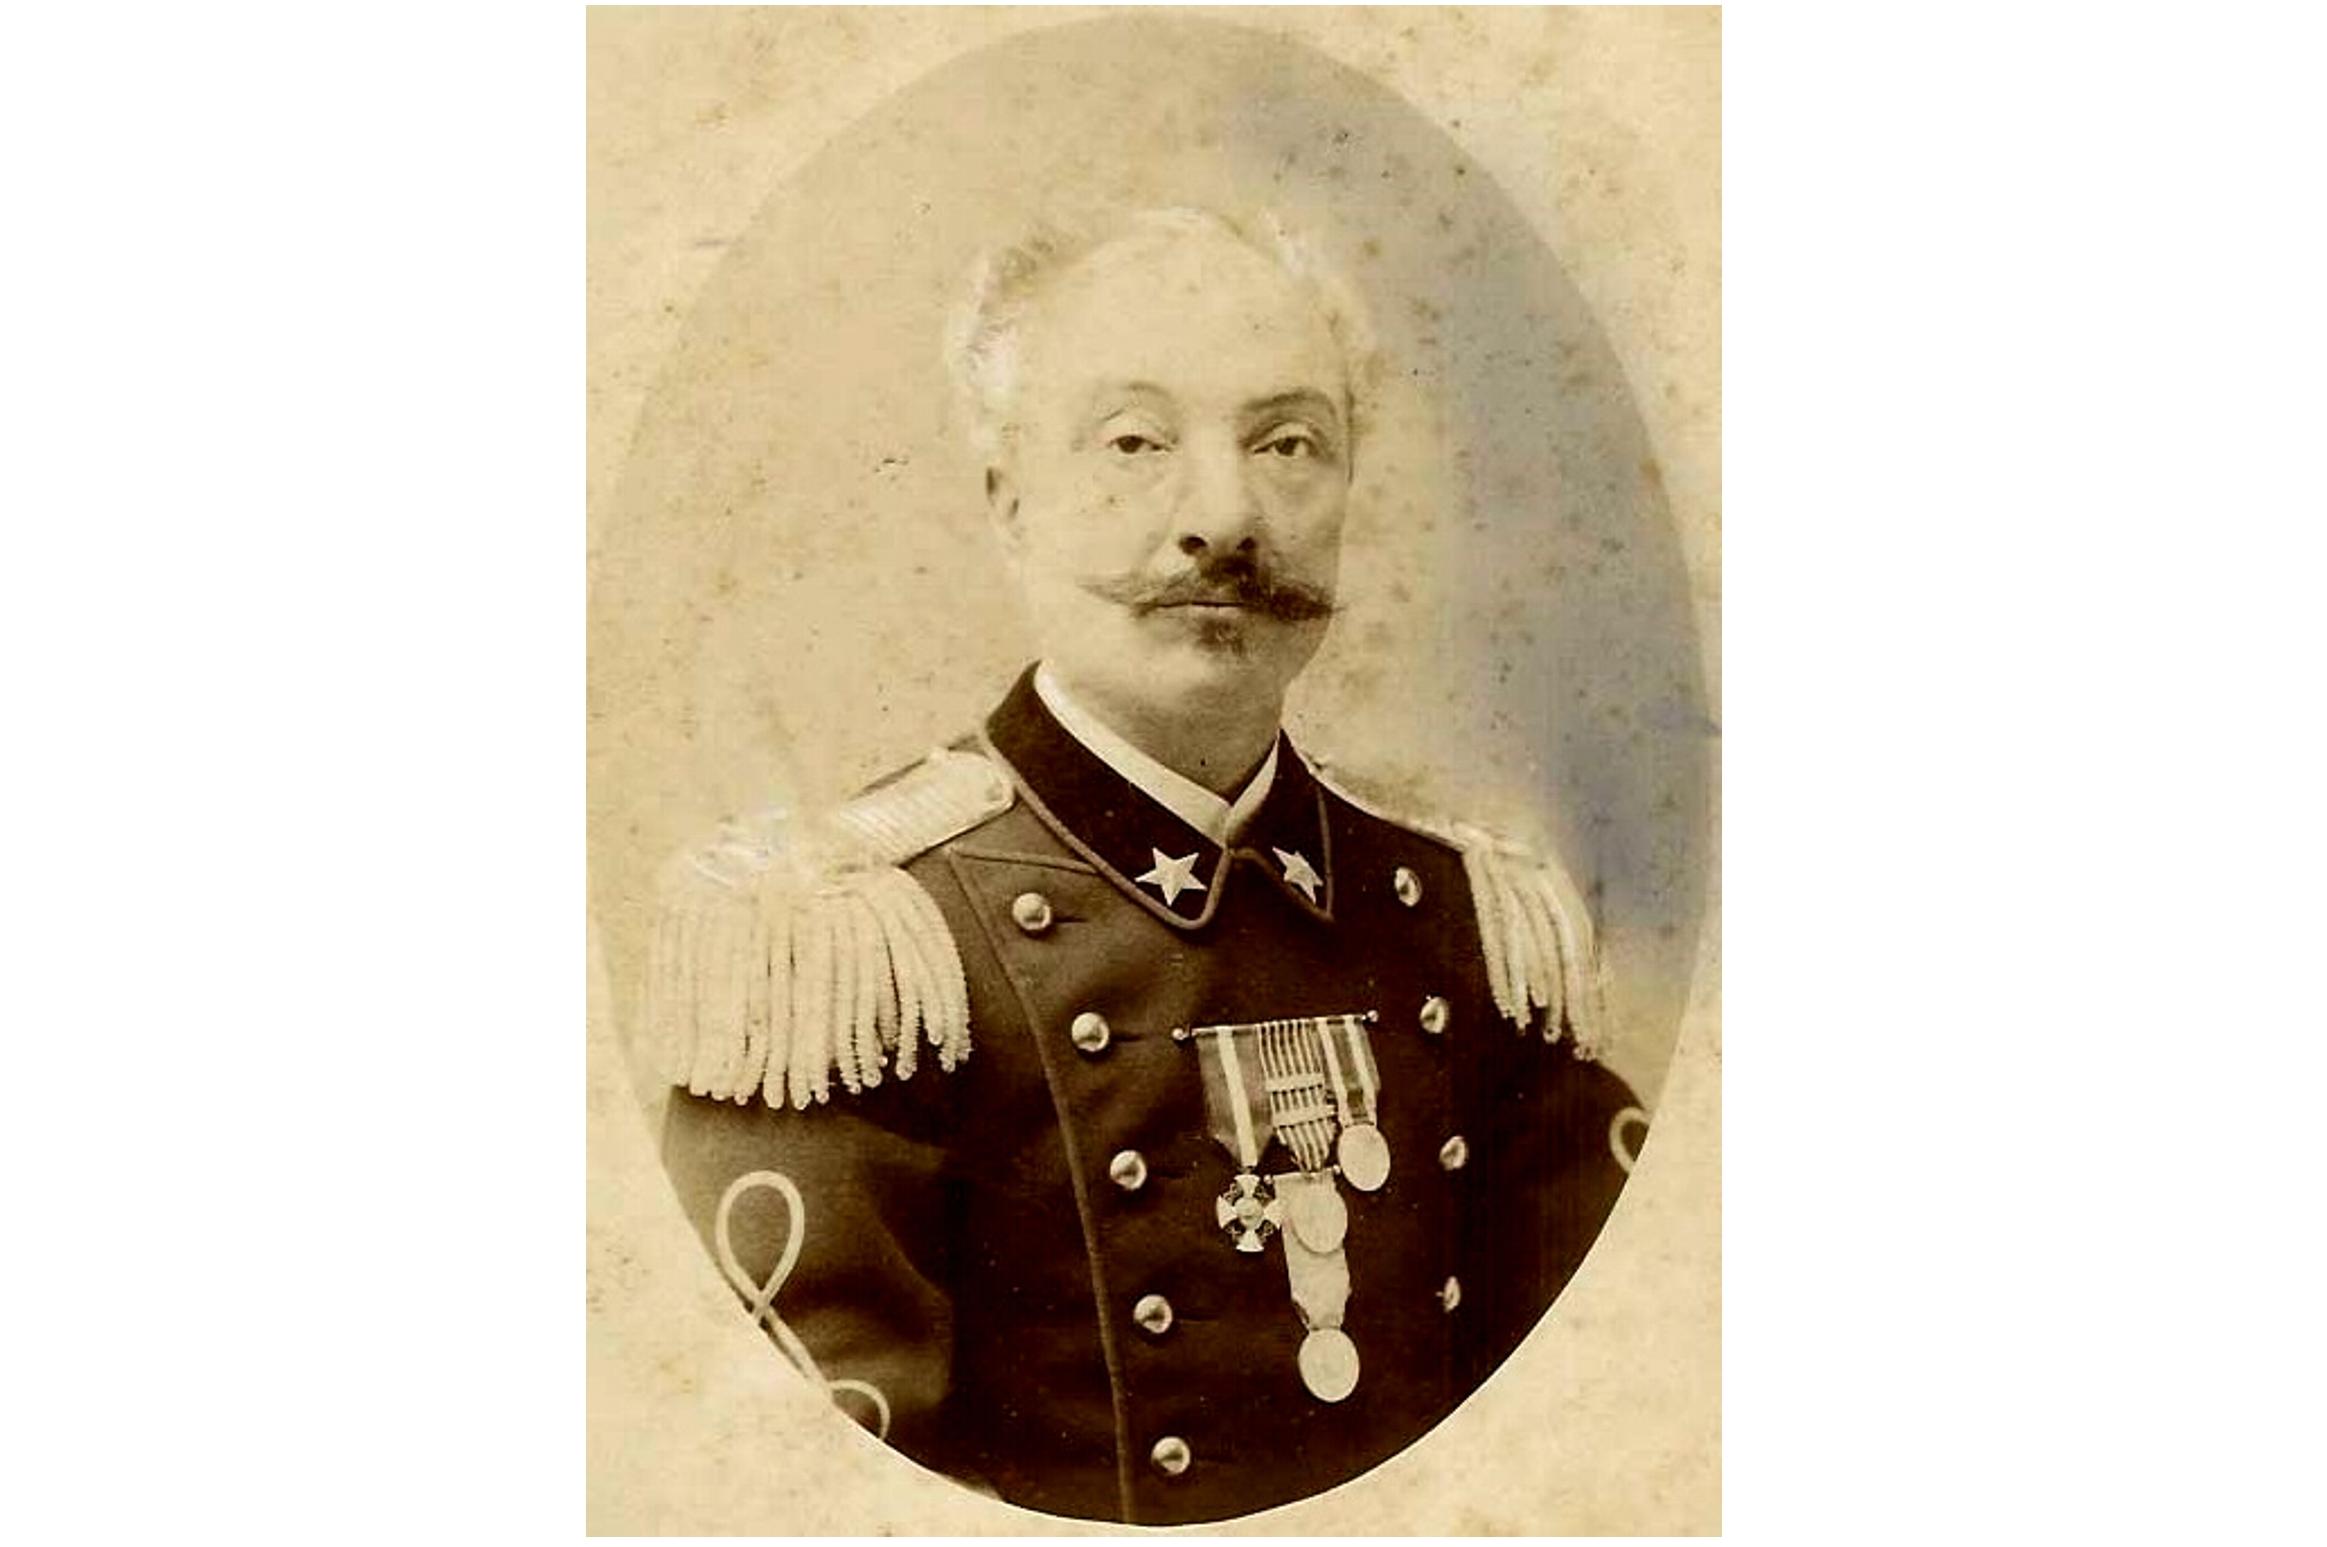 Africa 1887-1897: le medaglie d'oro al Valor Militare